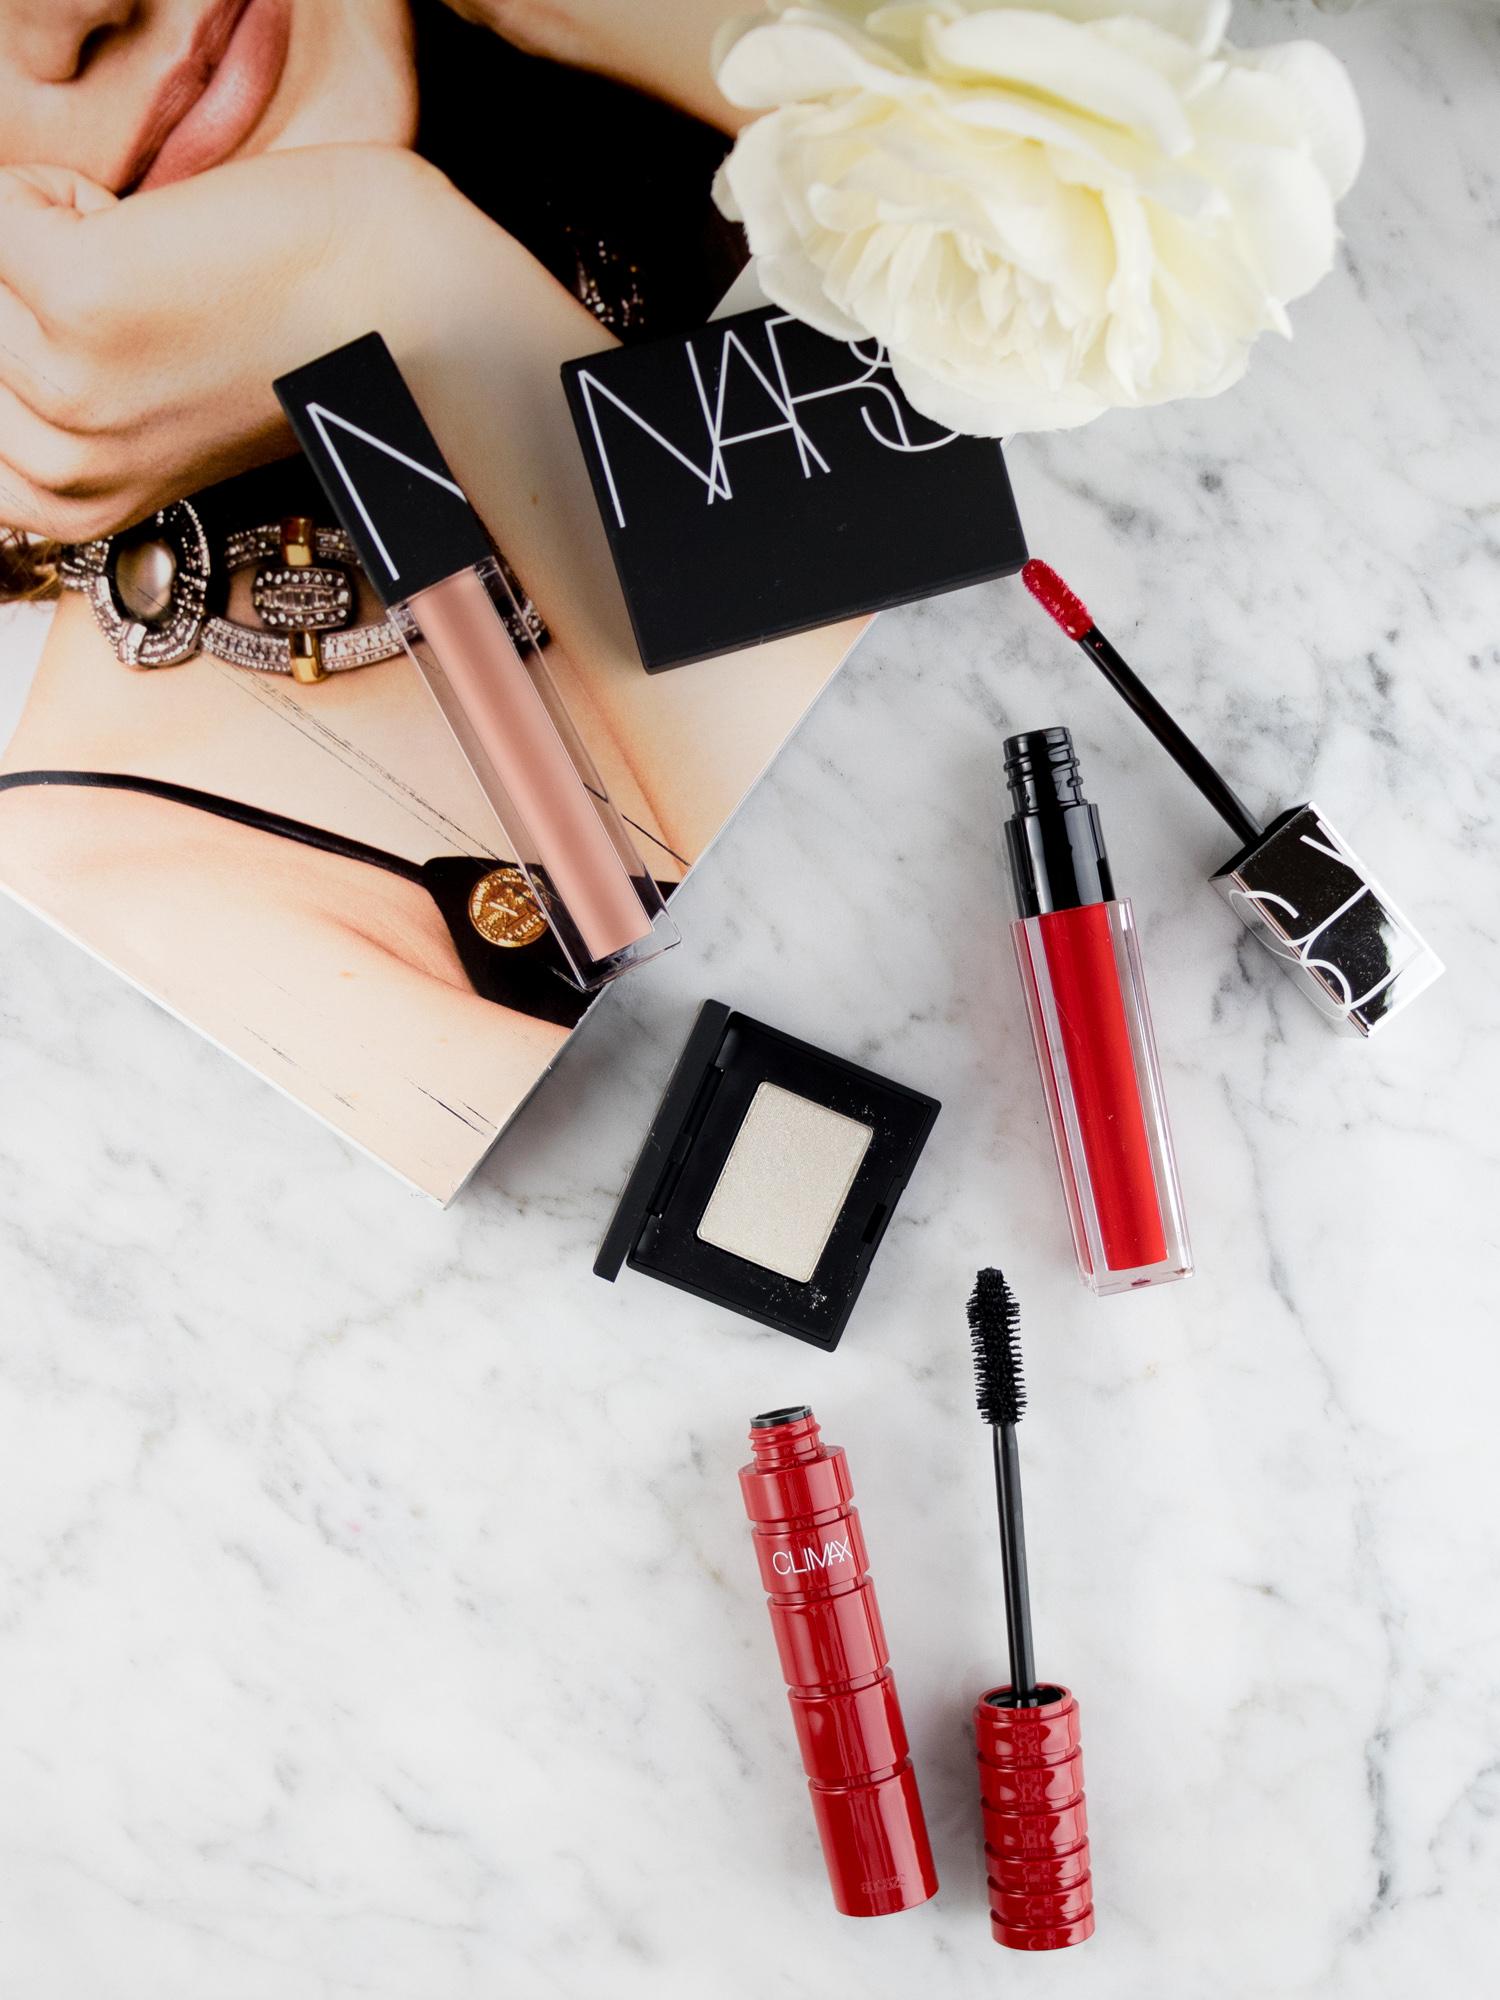 NARS Climax Volumizing Mascara